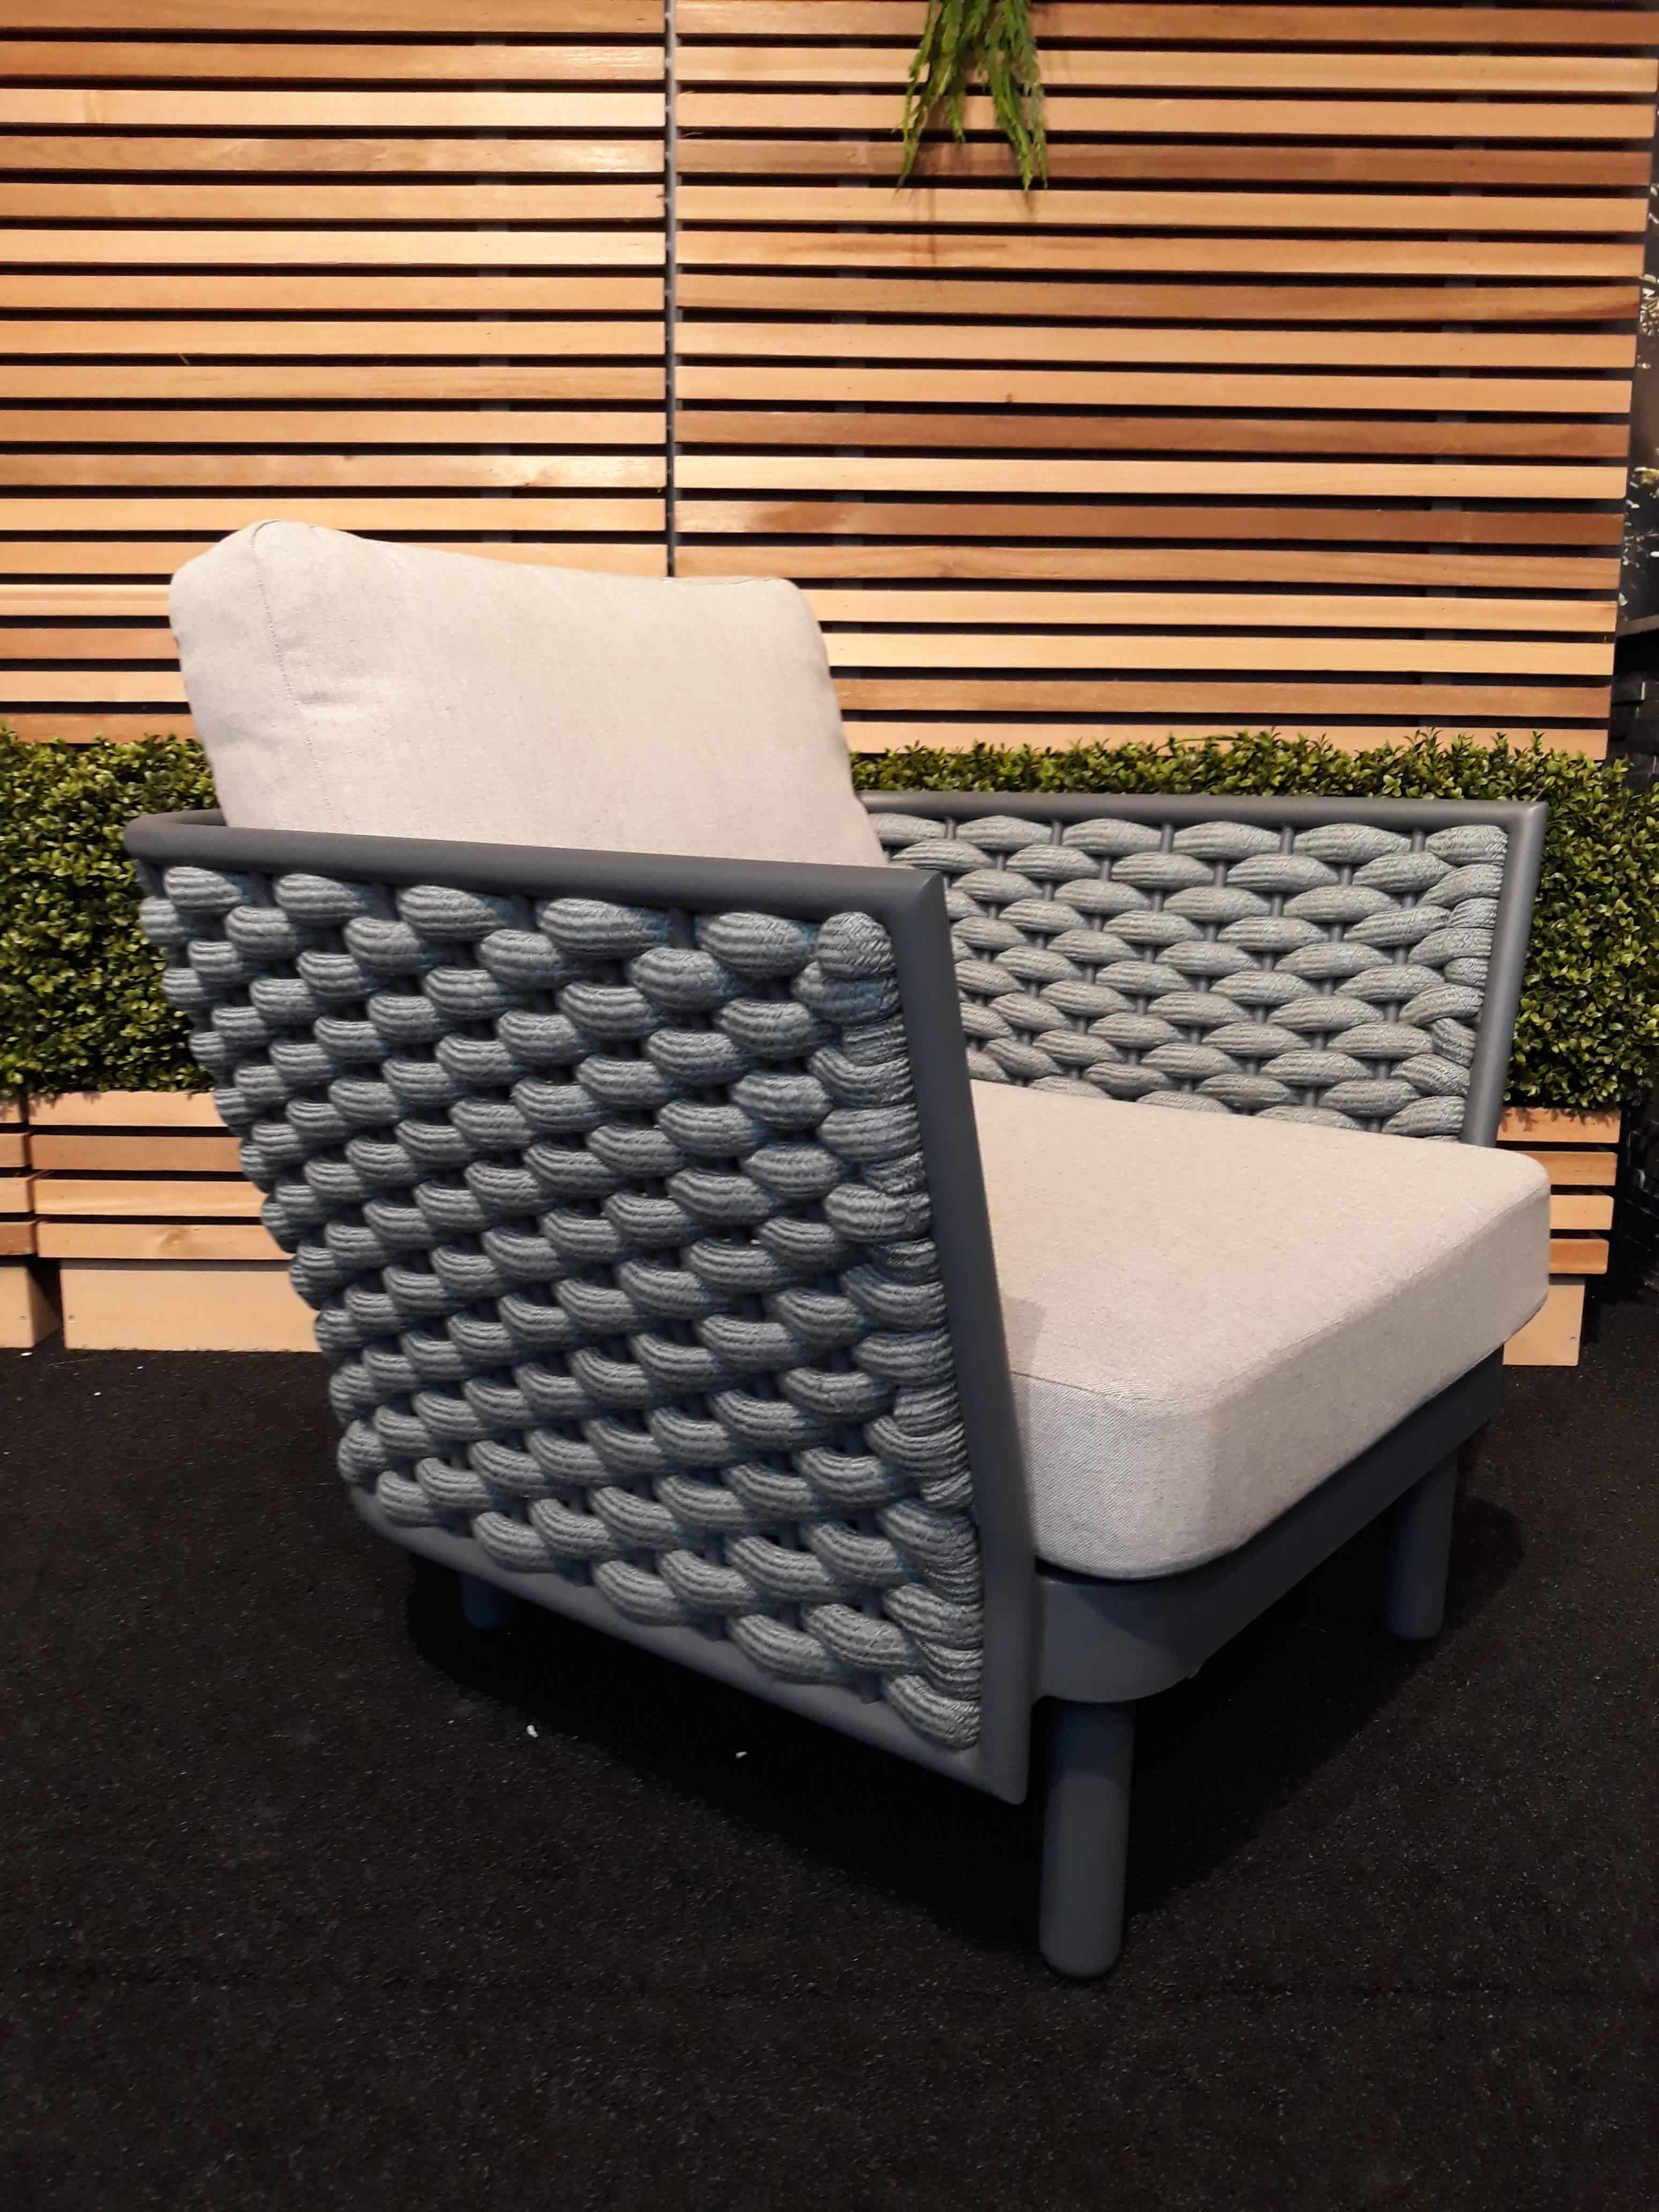 Leon arm chair outdoor furniture for sale dublin ireland